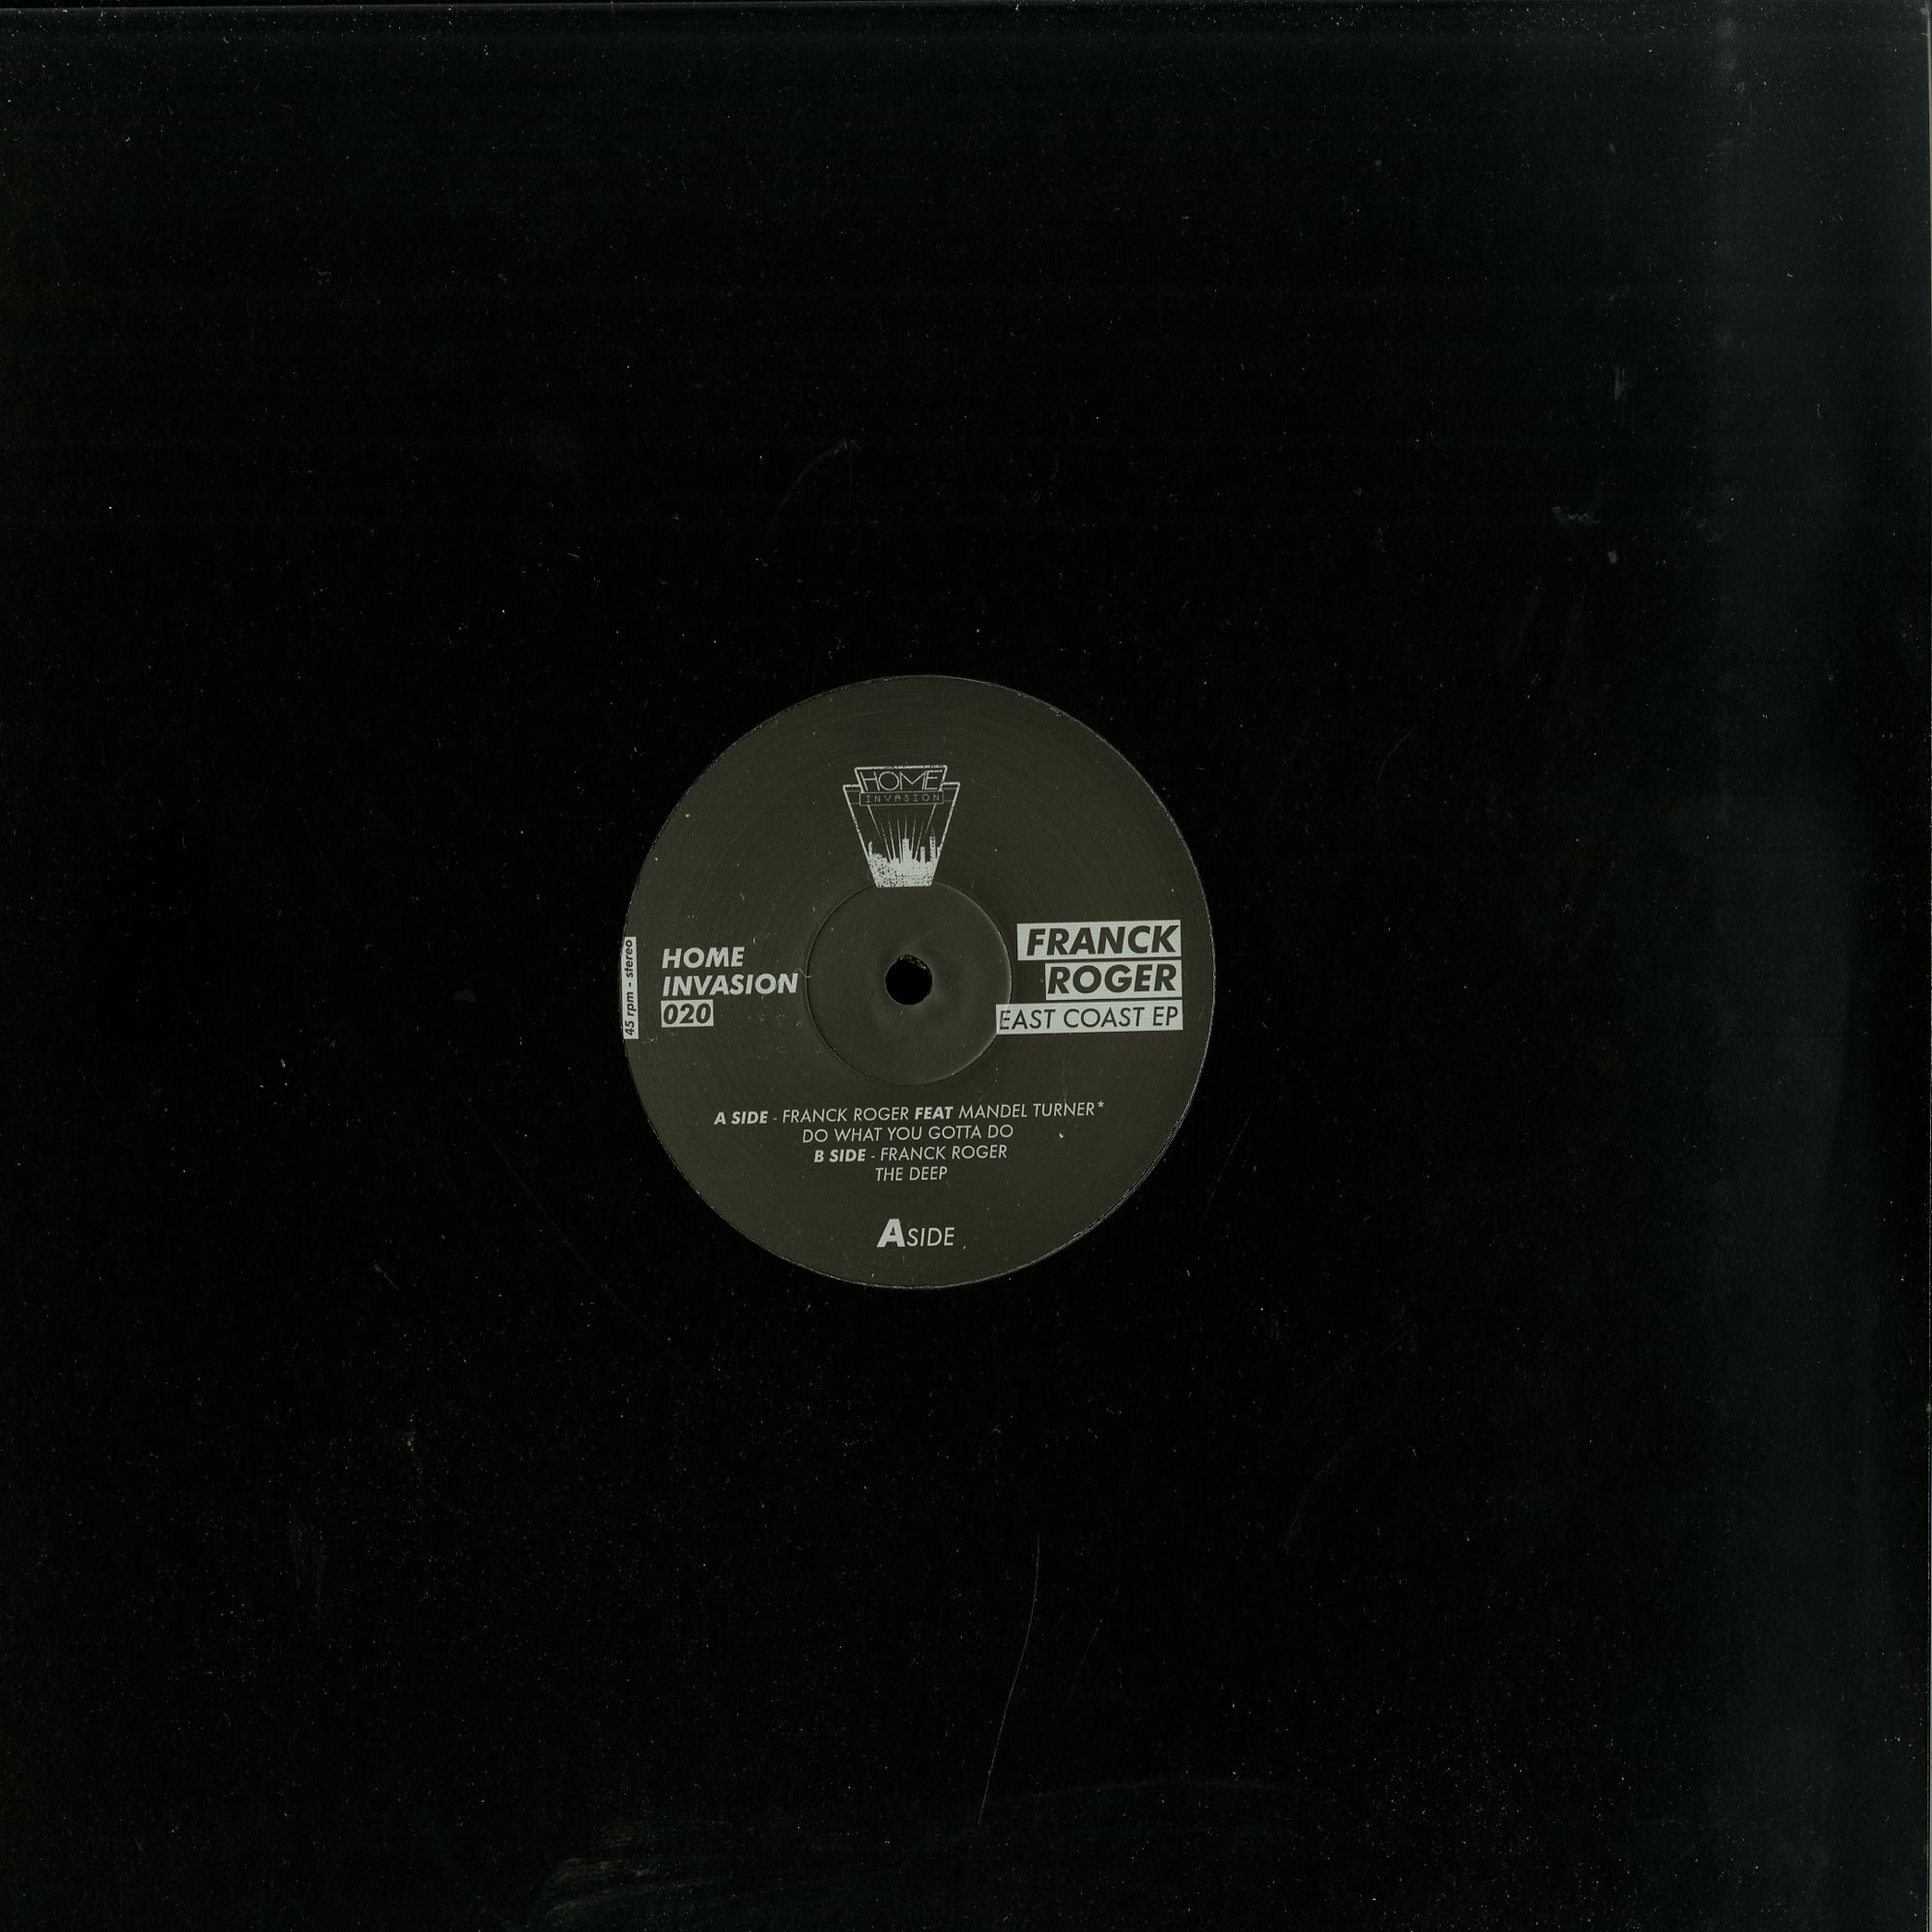 Franck Roger - EAST COAST EP